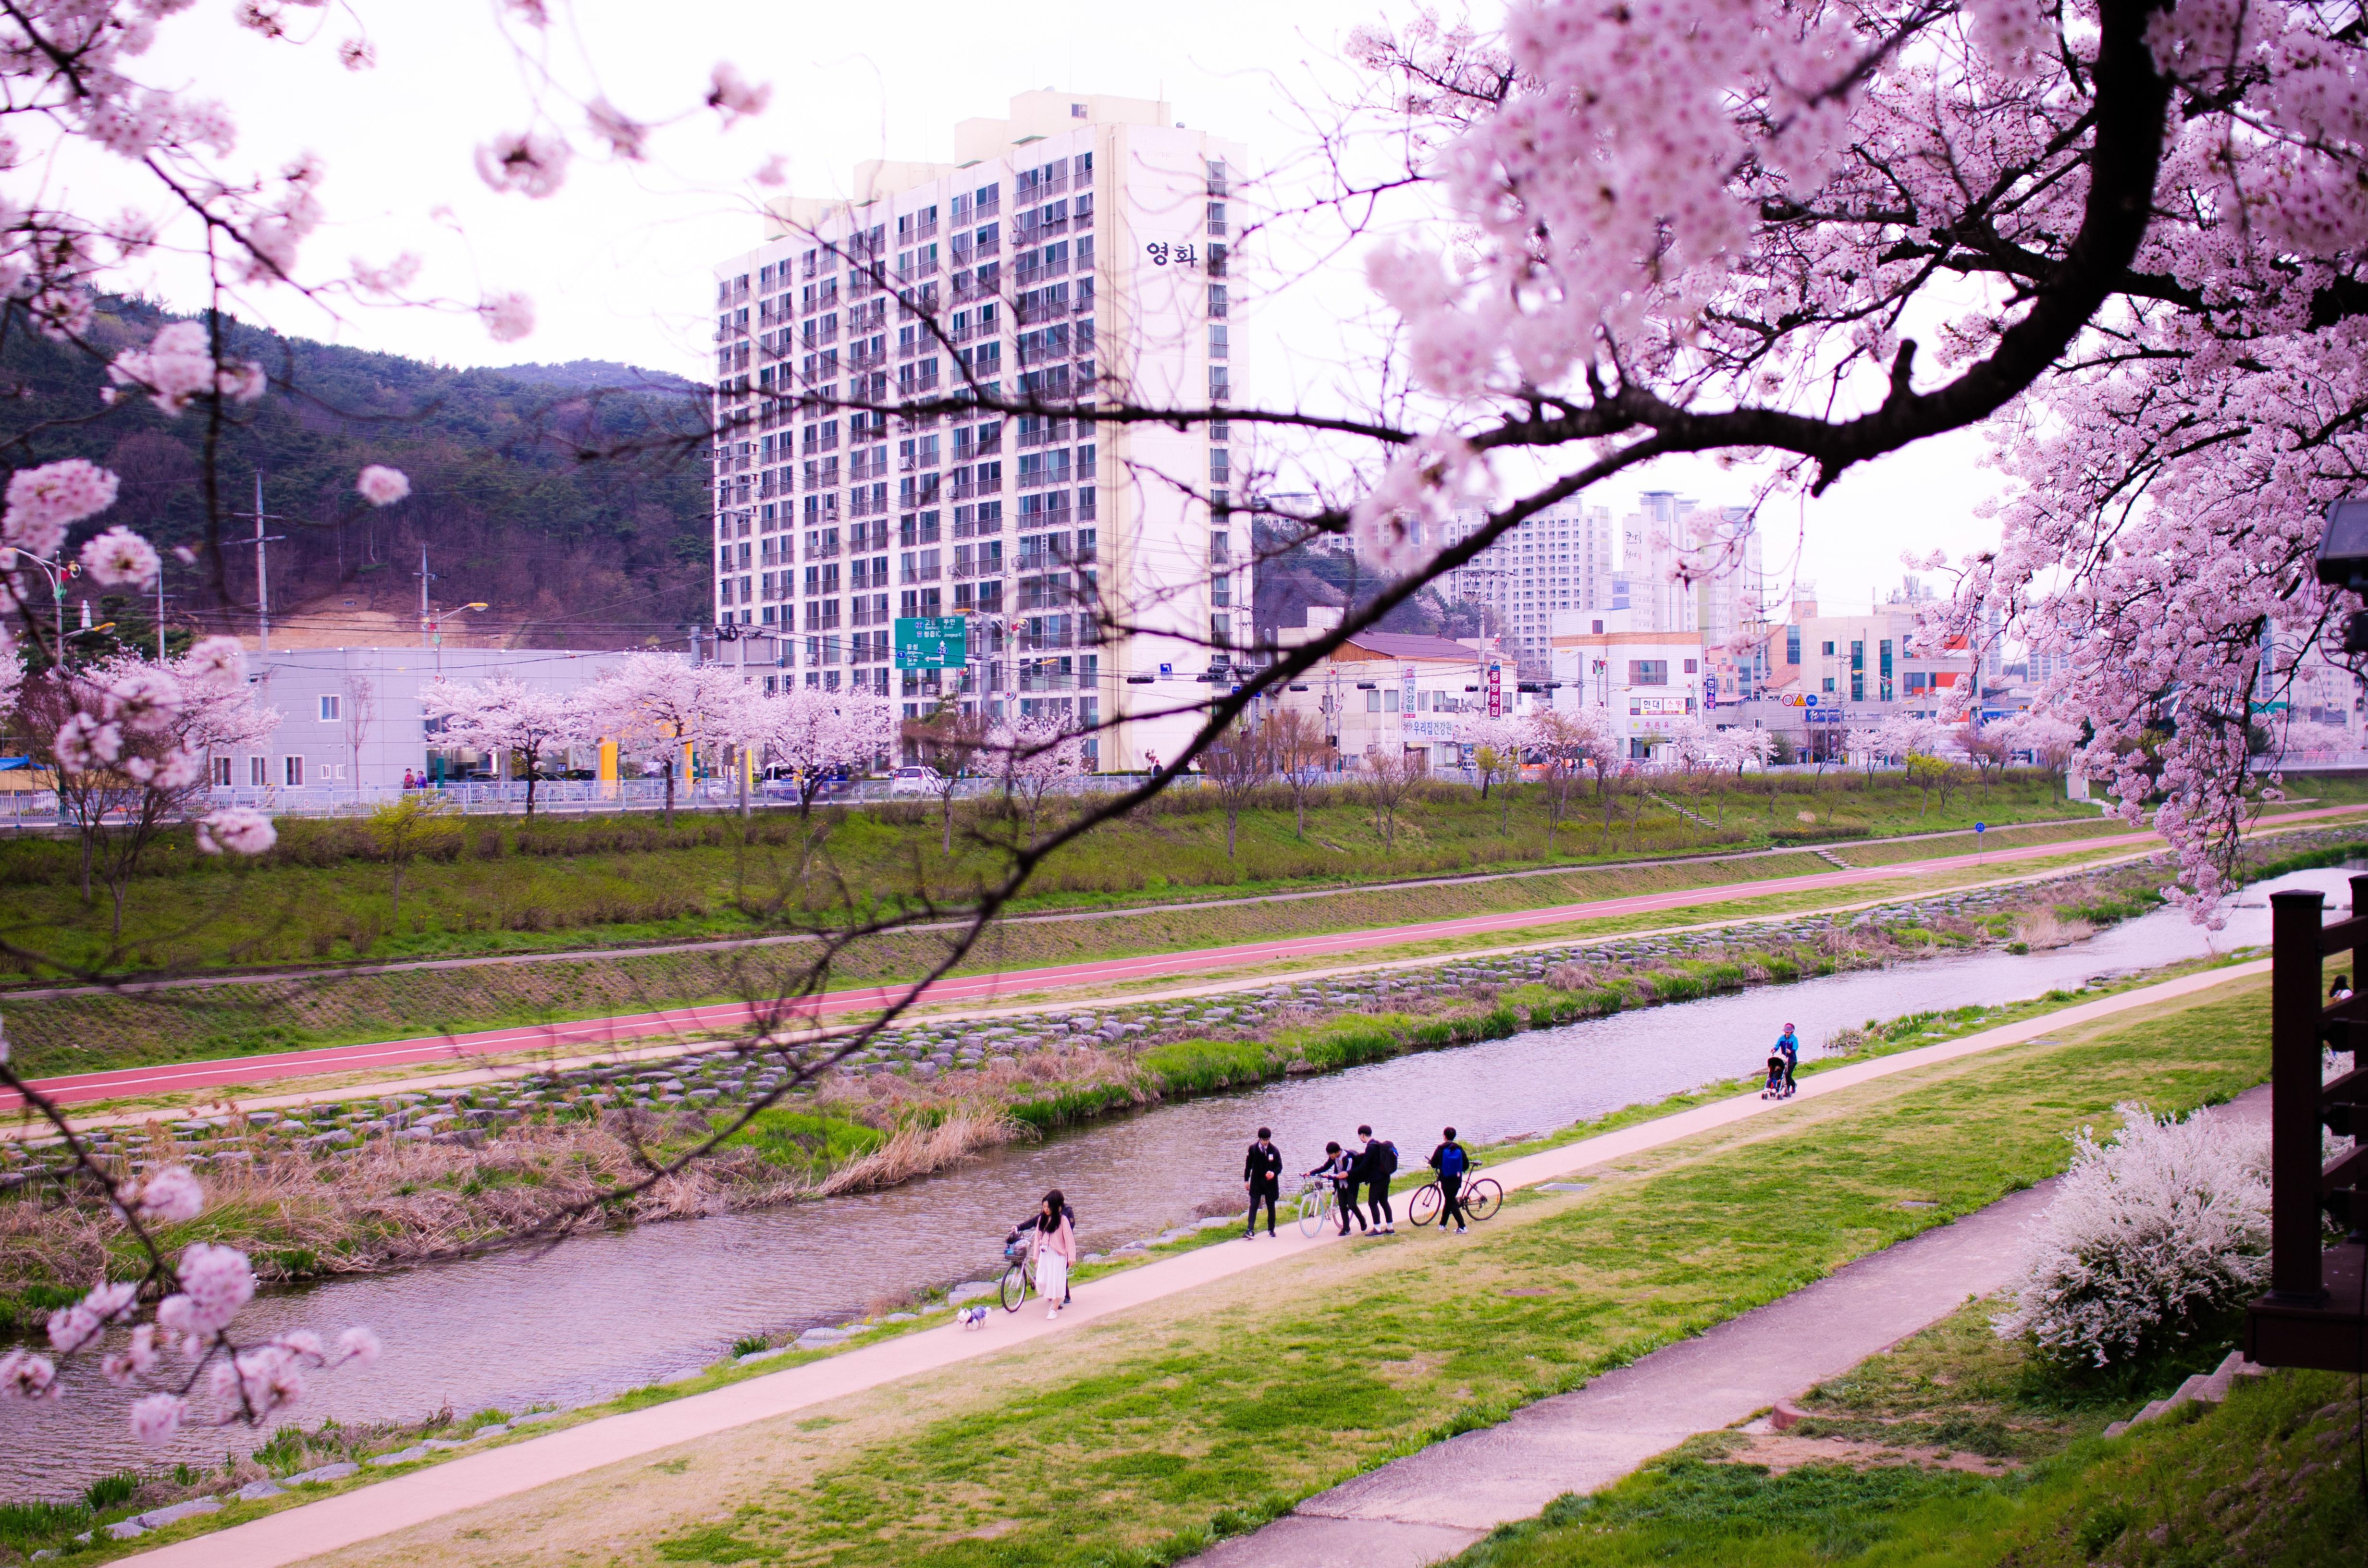 6- Blossoms